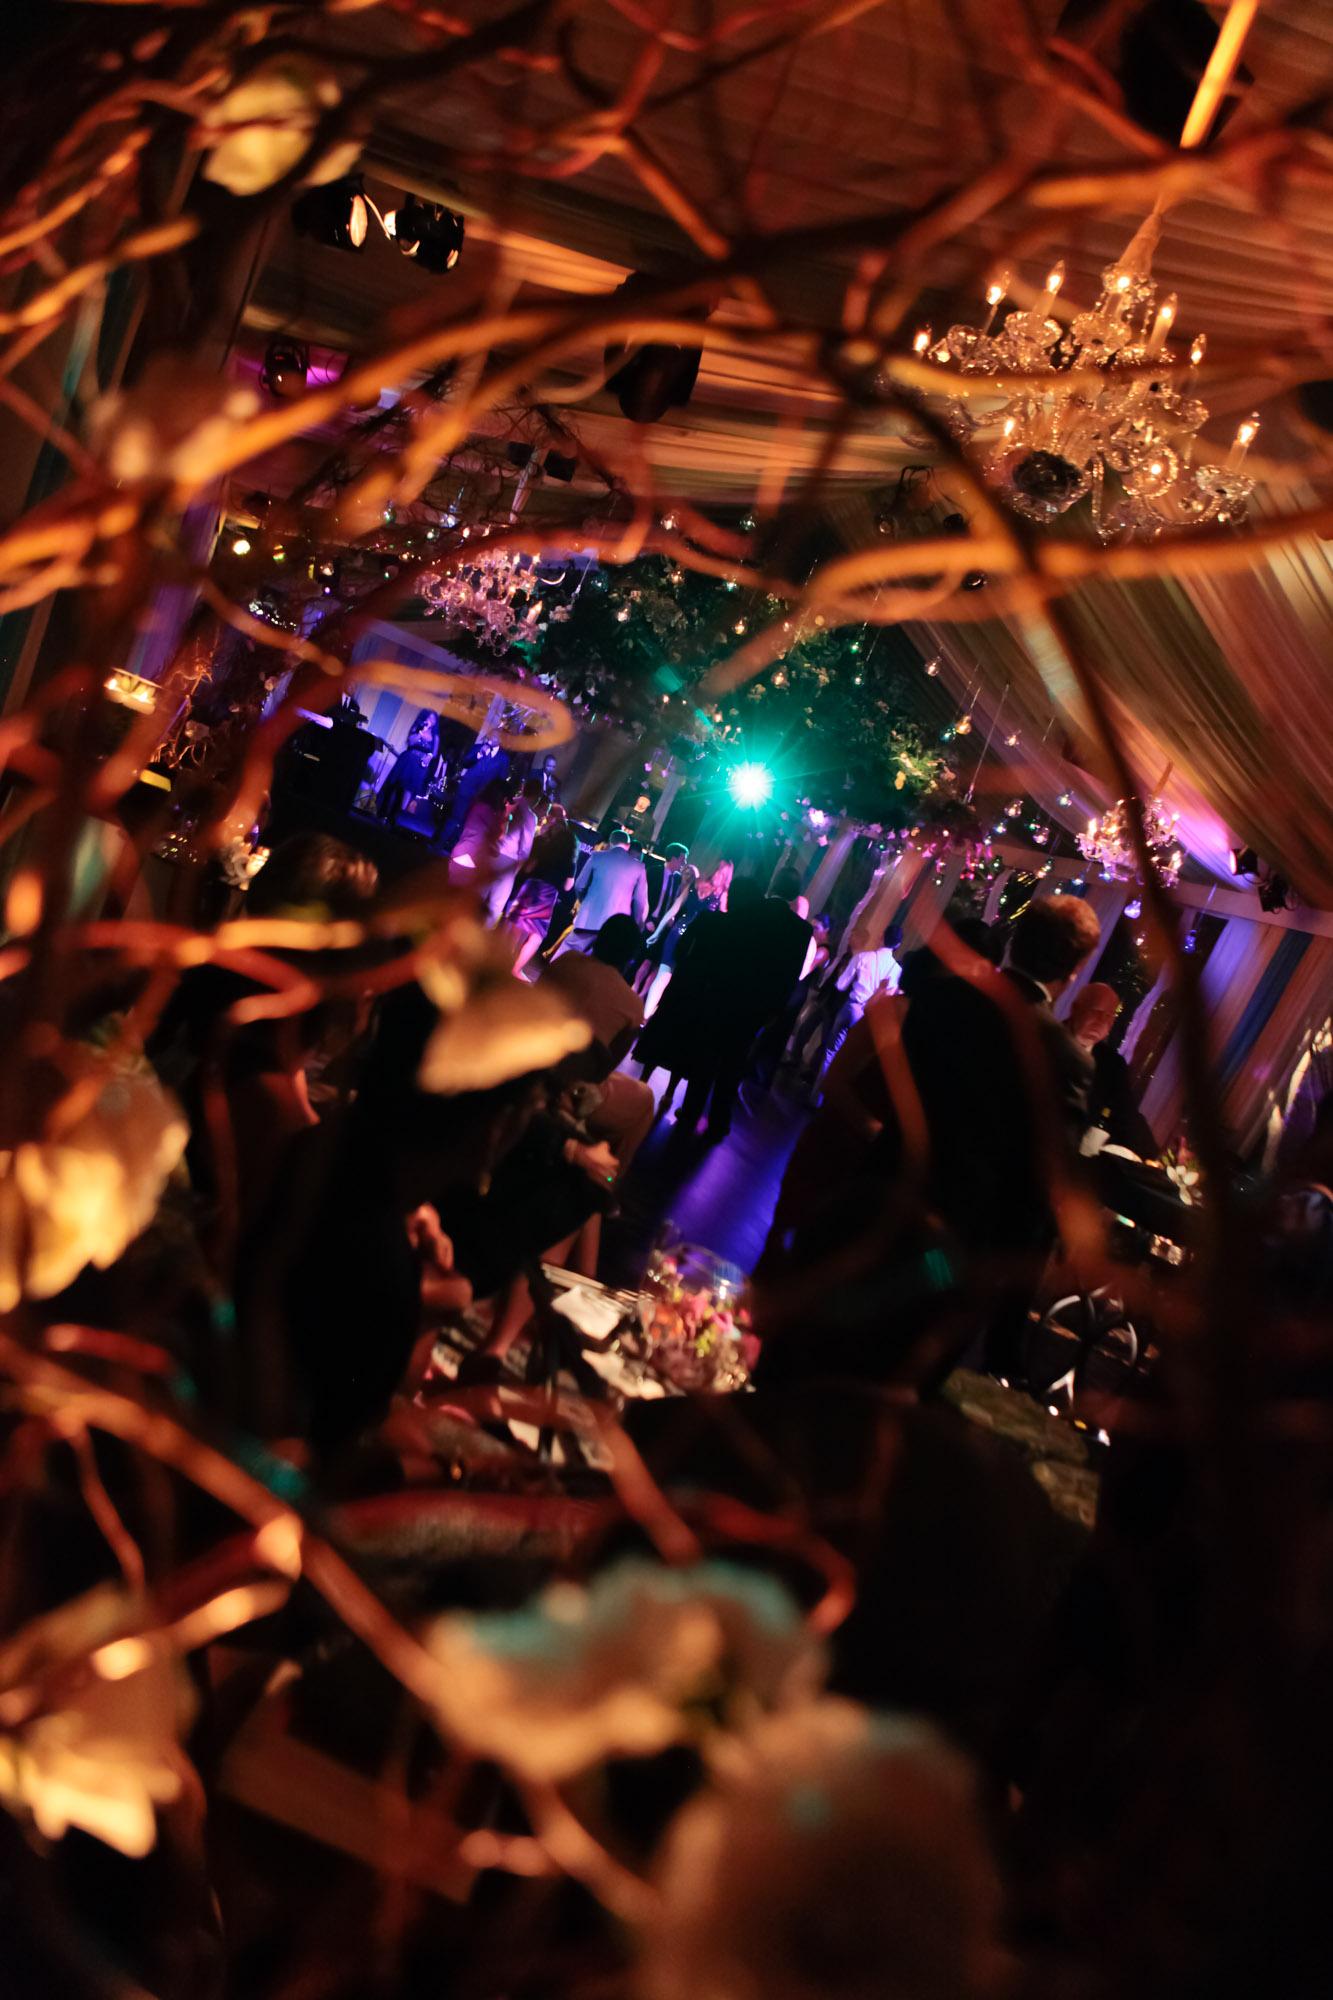 birch-bespoke-events-and-weddings-26.jpg